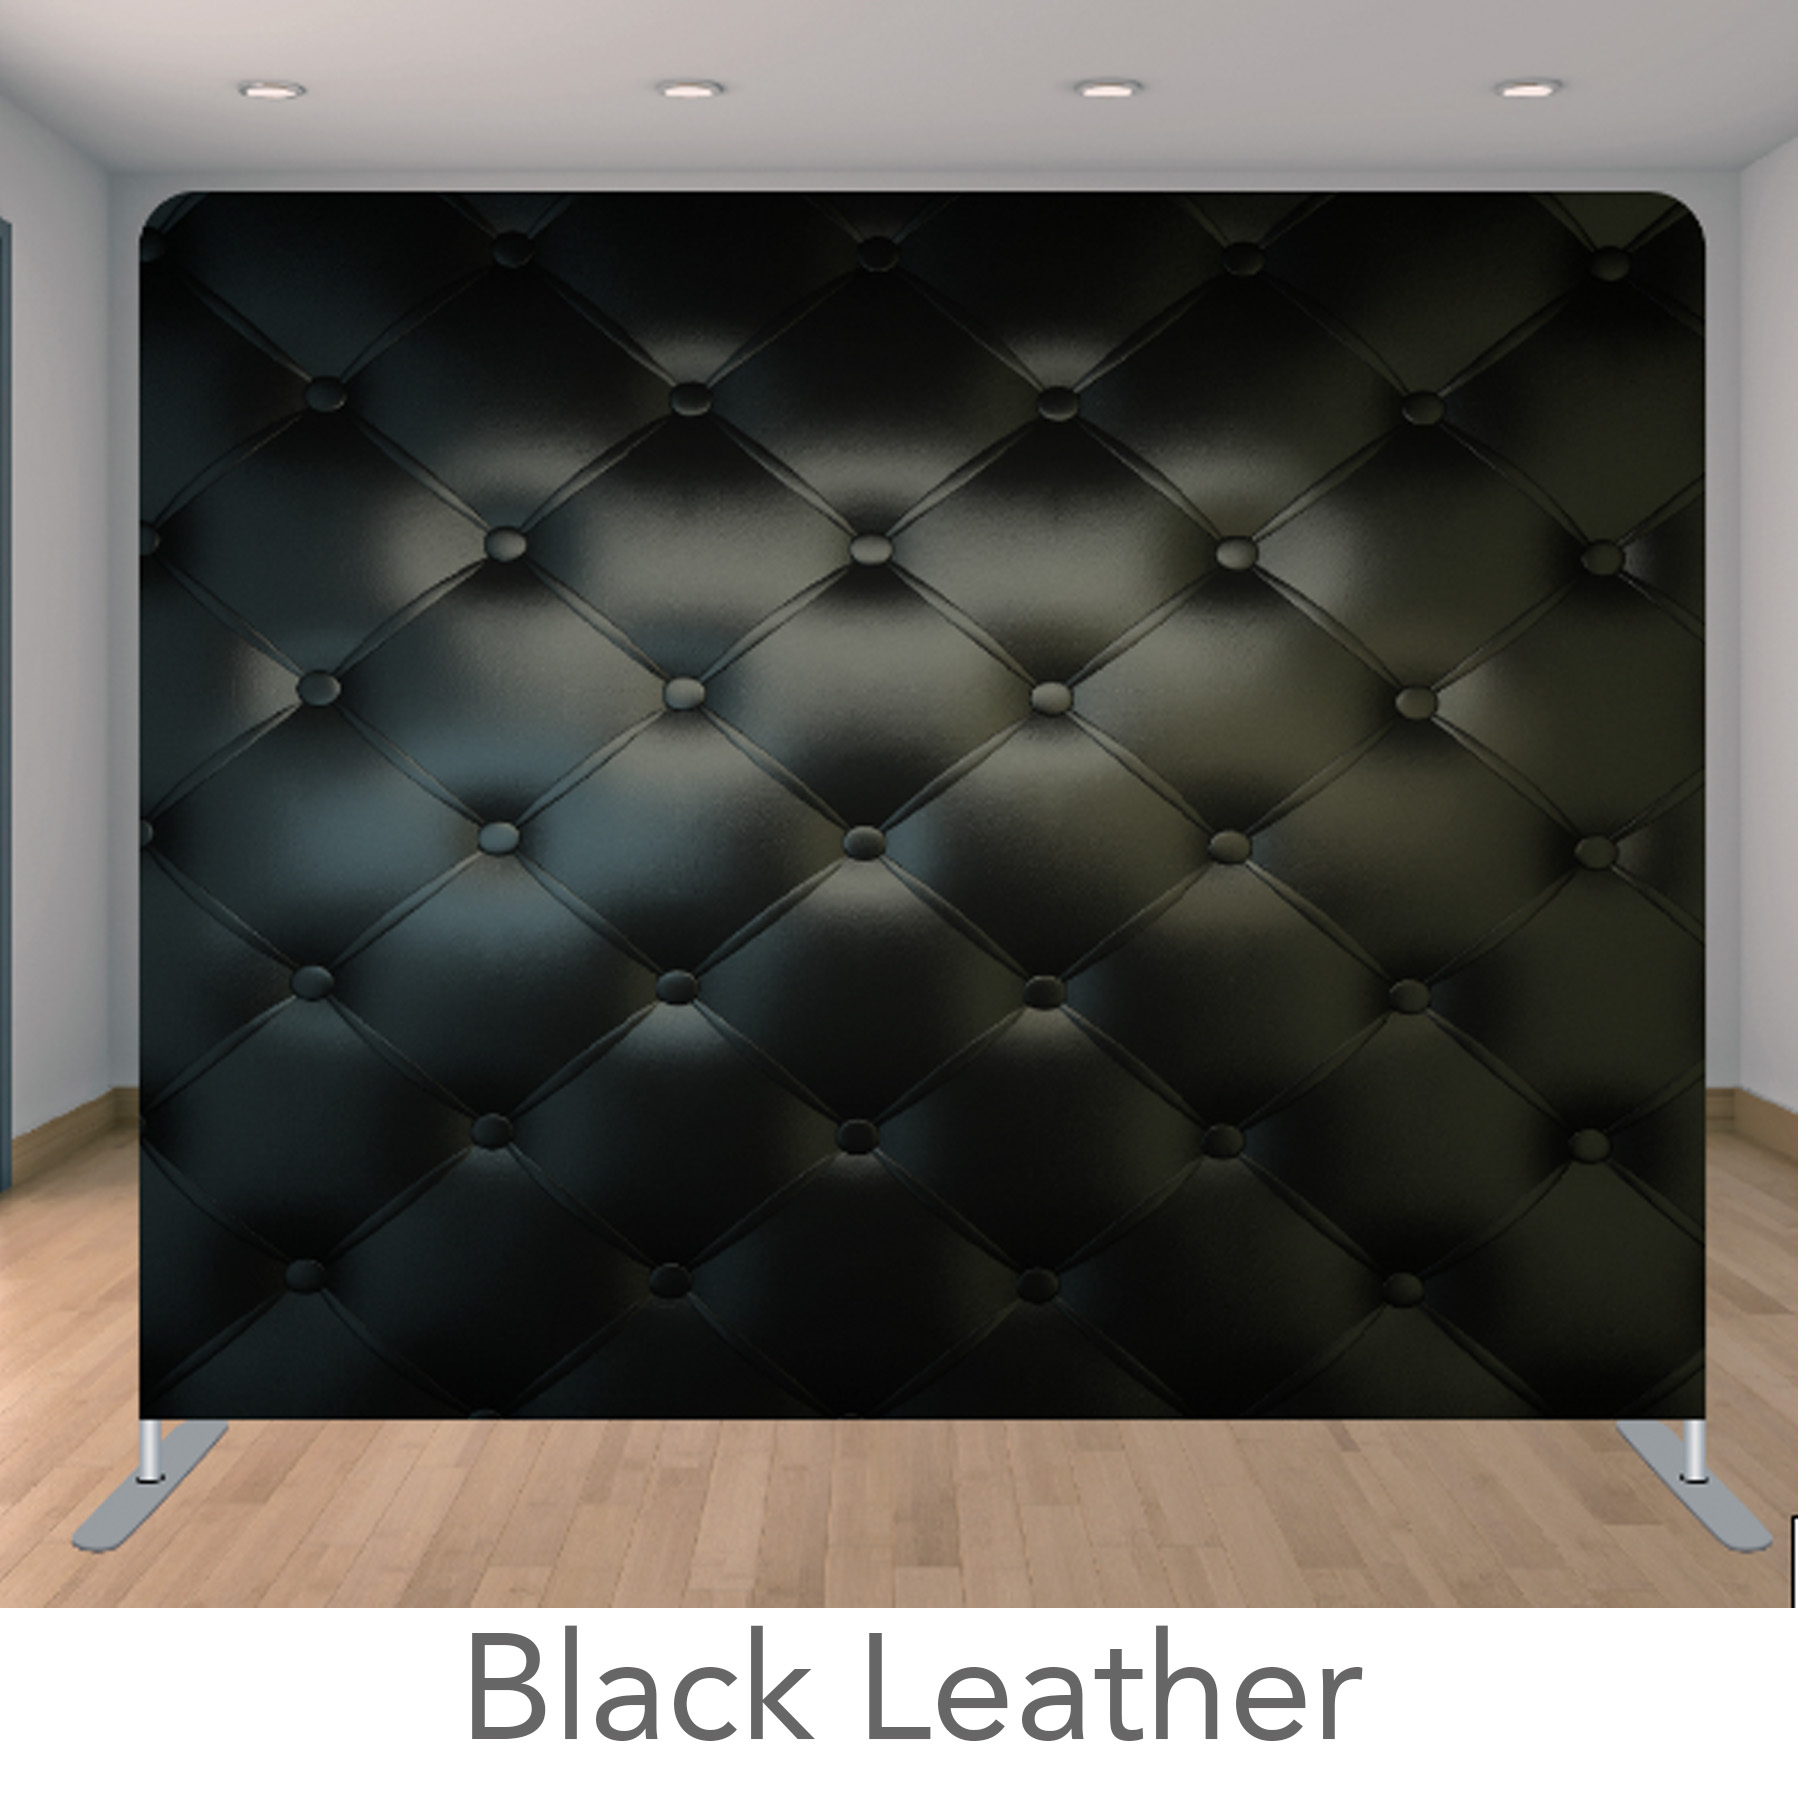 BlackLeather.jpg